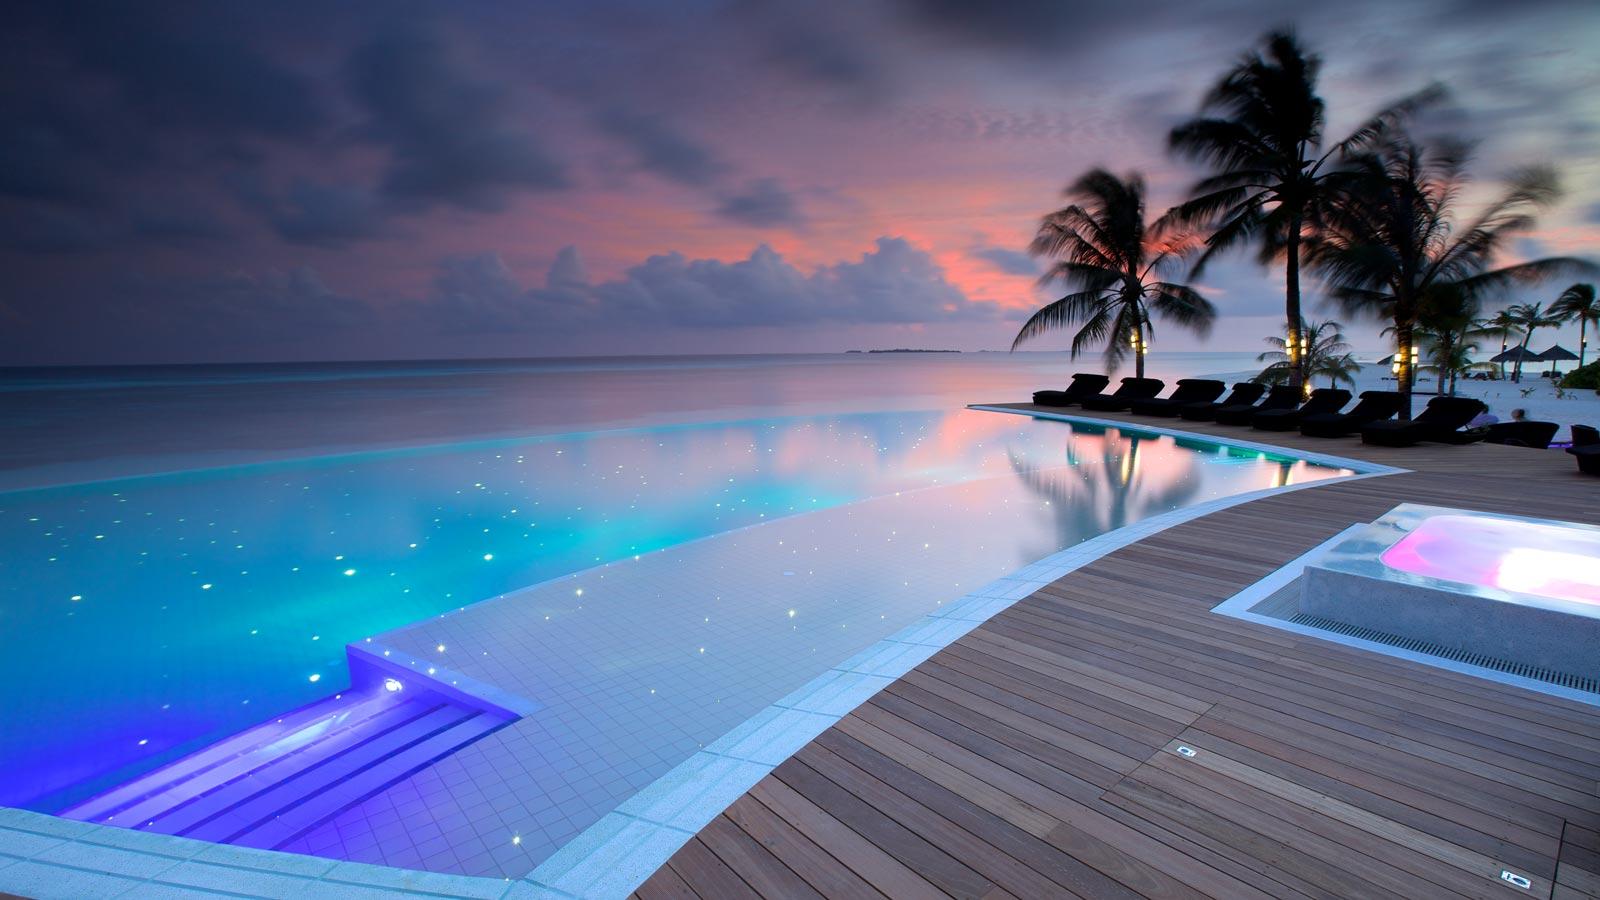 Sangu_Pool_Evening_1600x900